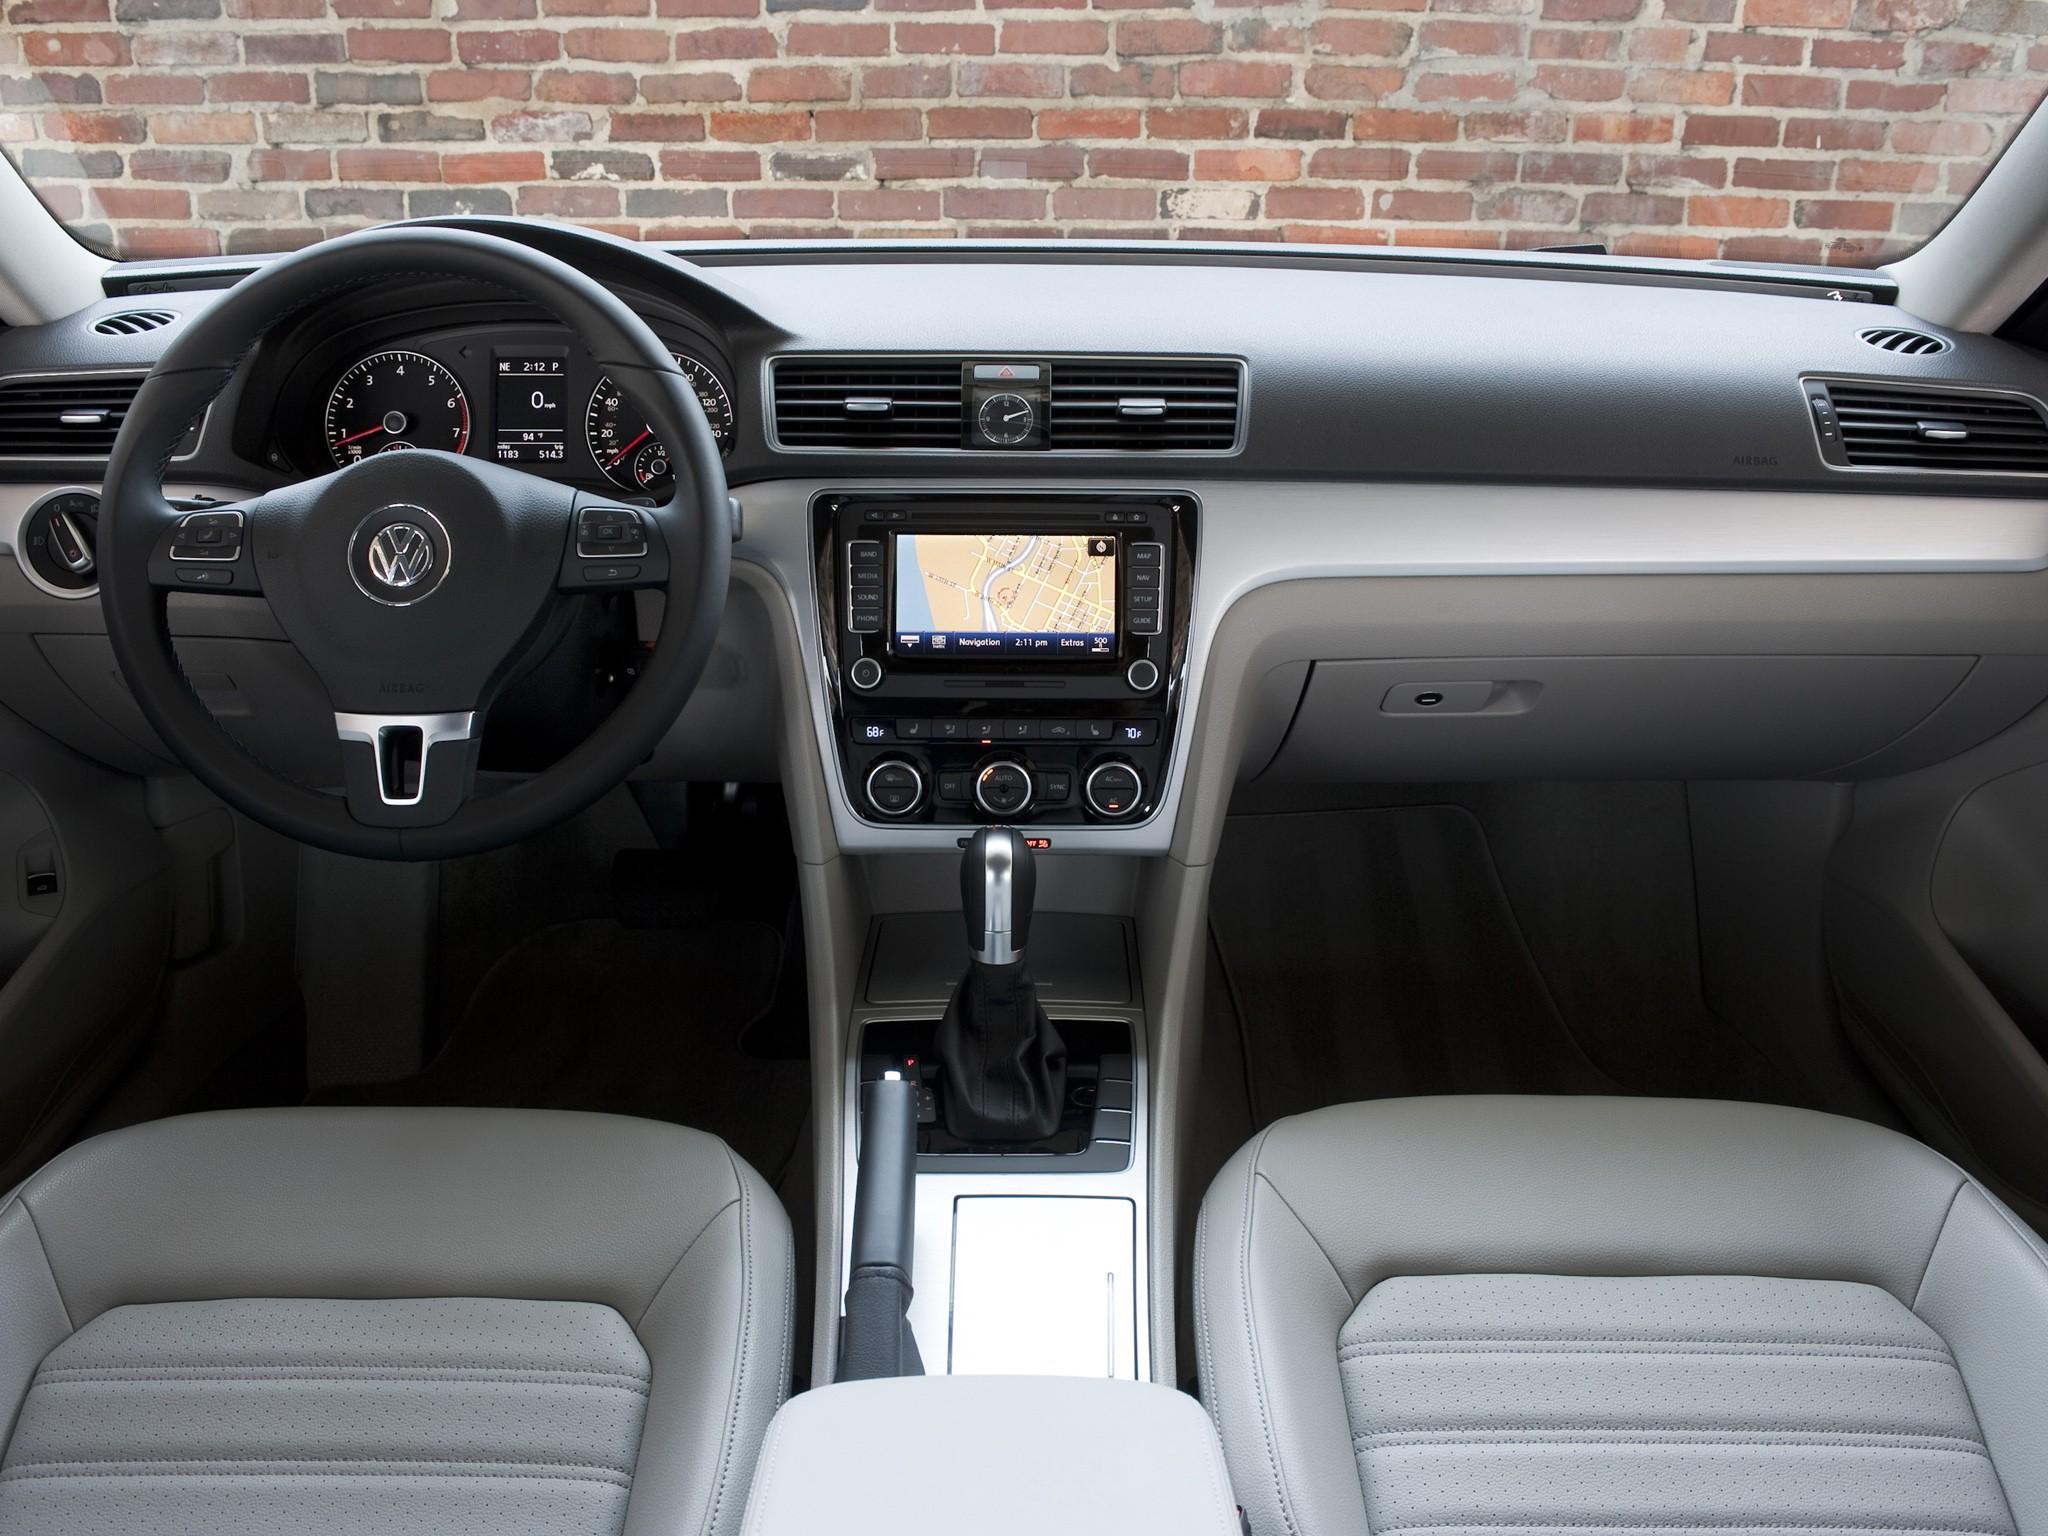 volkswagen passat us specs photos 2012 2013 2014 2015 2016 2017 2018 2019 autoevolution. Black Bedroom Furniture Sets. Home Design Ideas